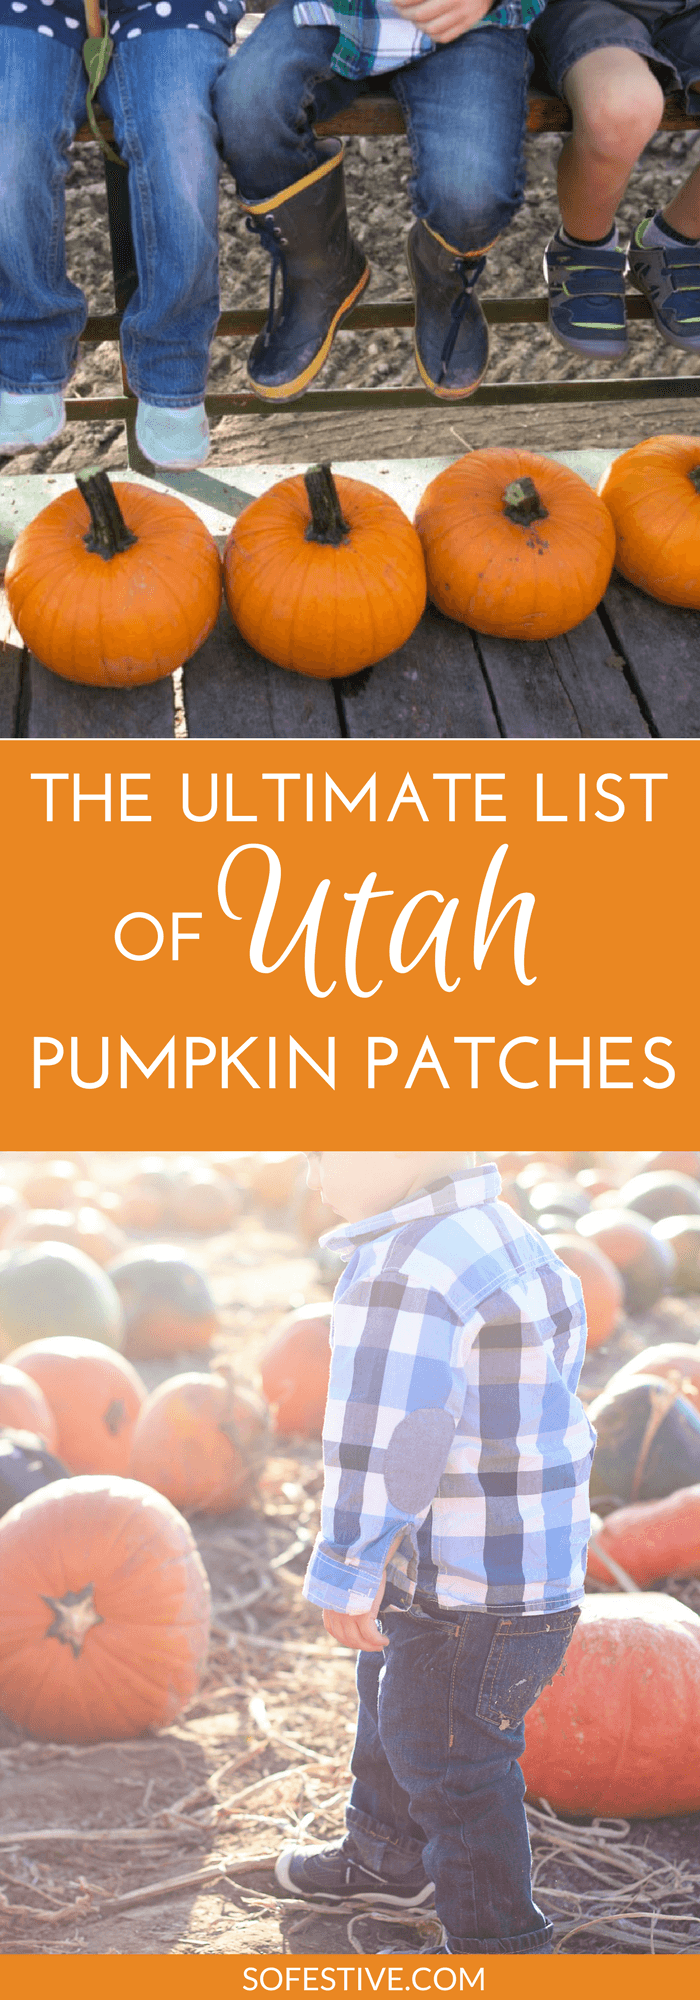 2019 Utah Pumpkin Patches, Corn Mazes, and Fall Fun